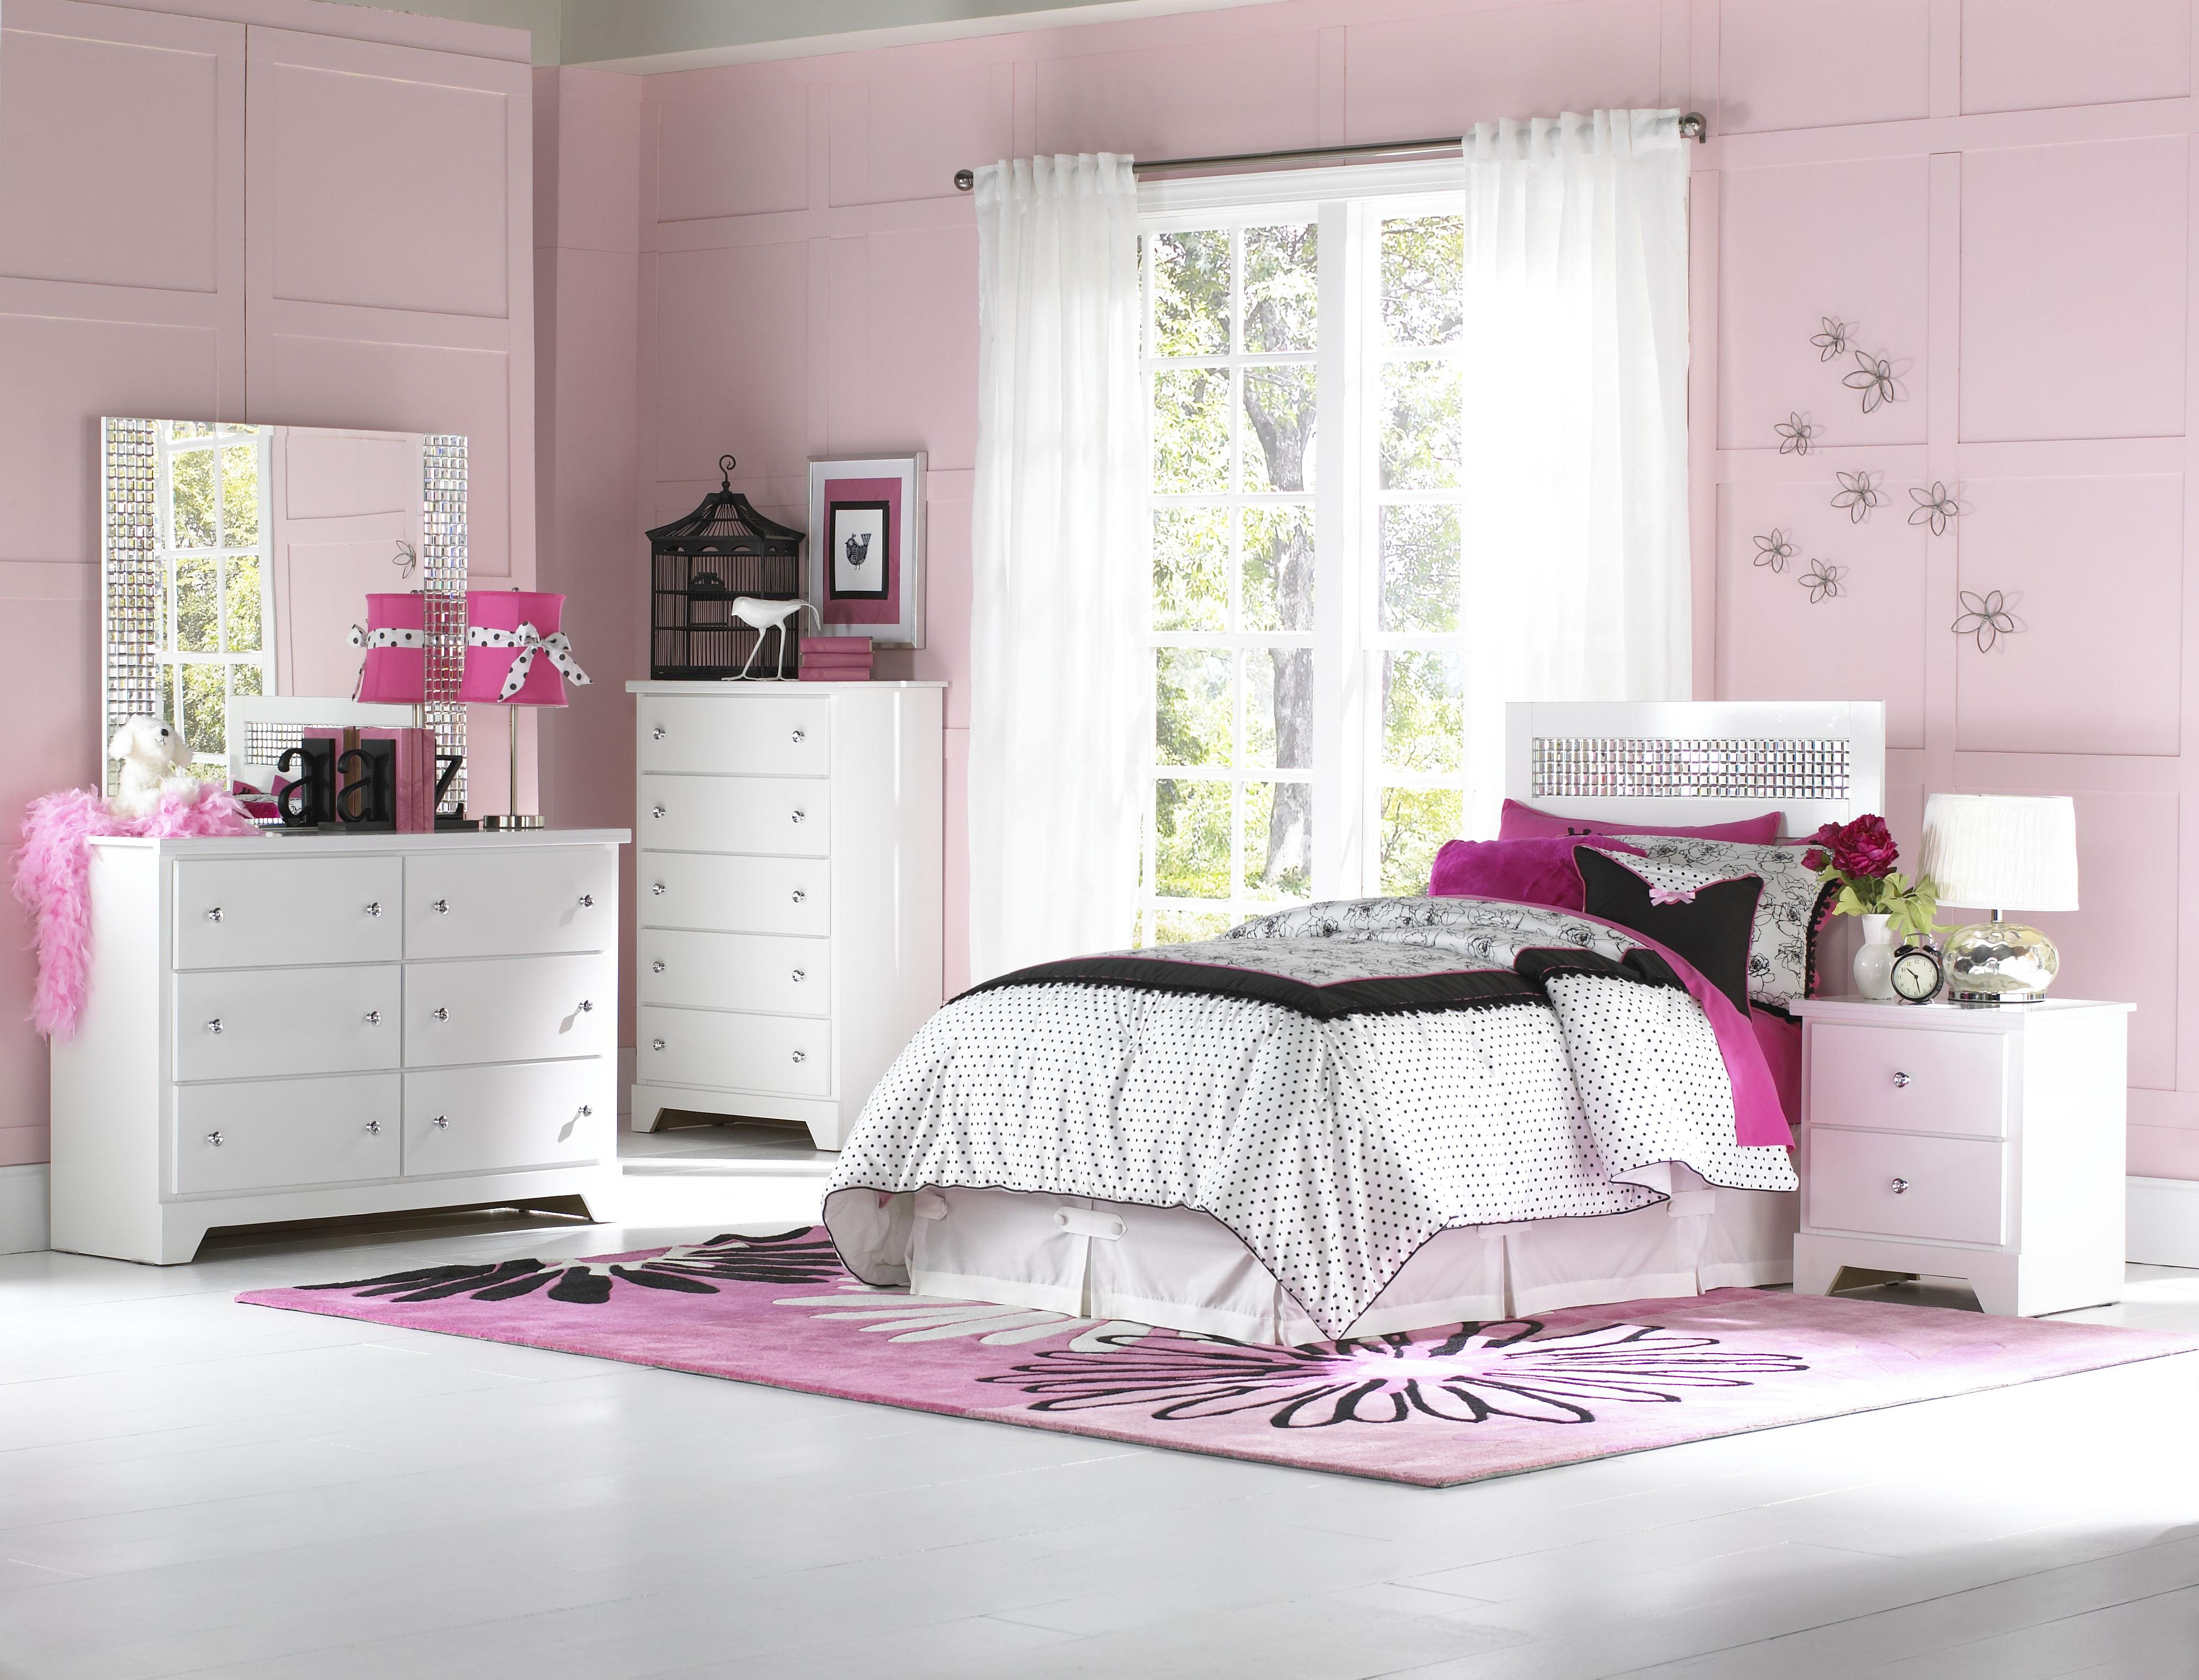 Standard Furniture Marilyn Youth Full Bedroom Group - Item Number: 66300 F Bedroom Group 1